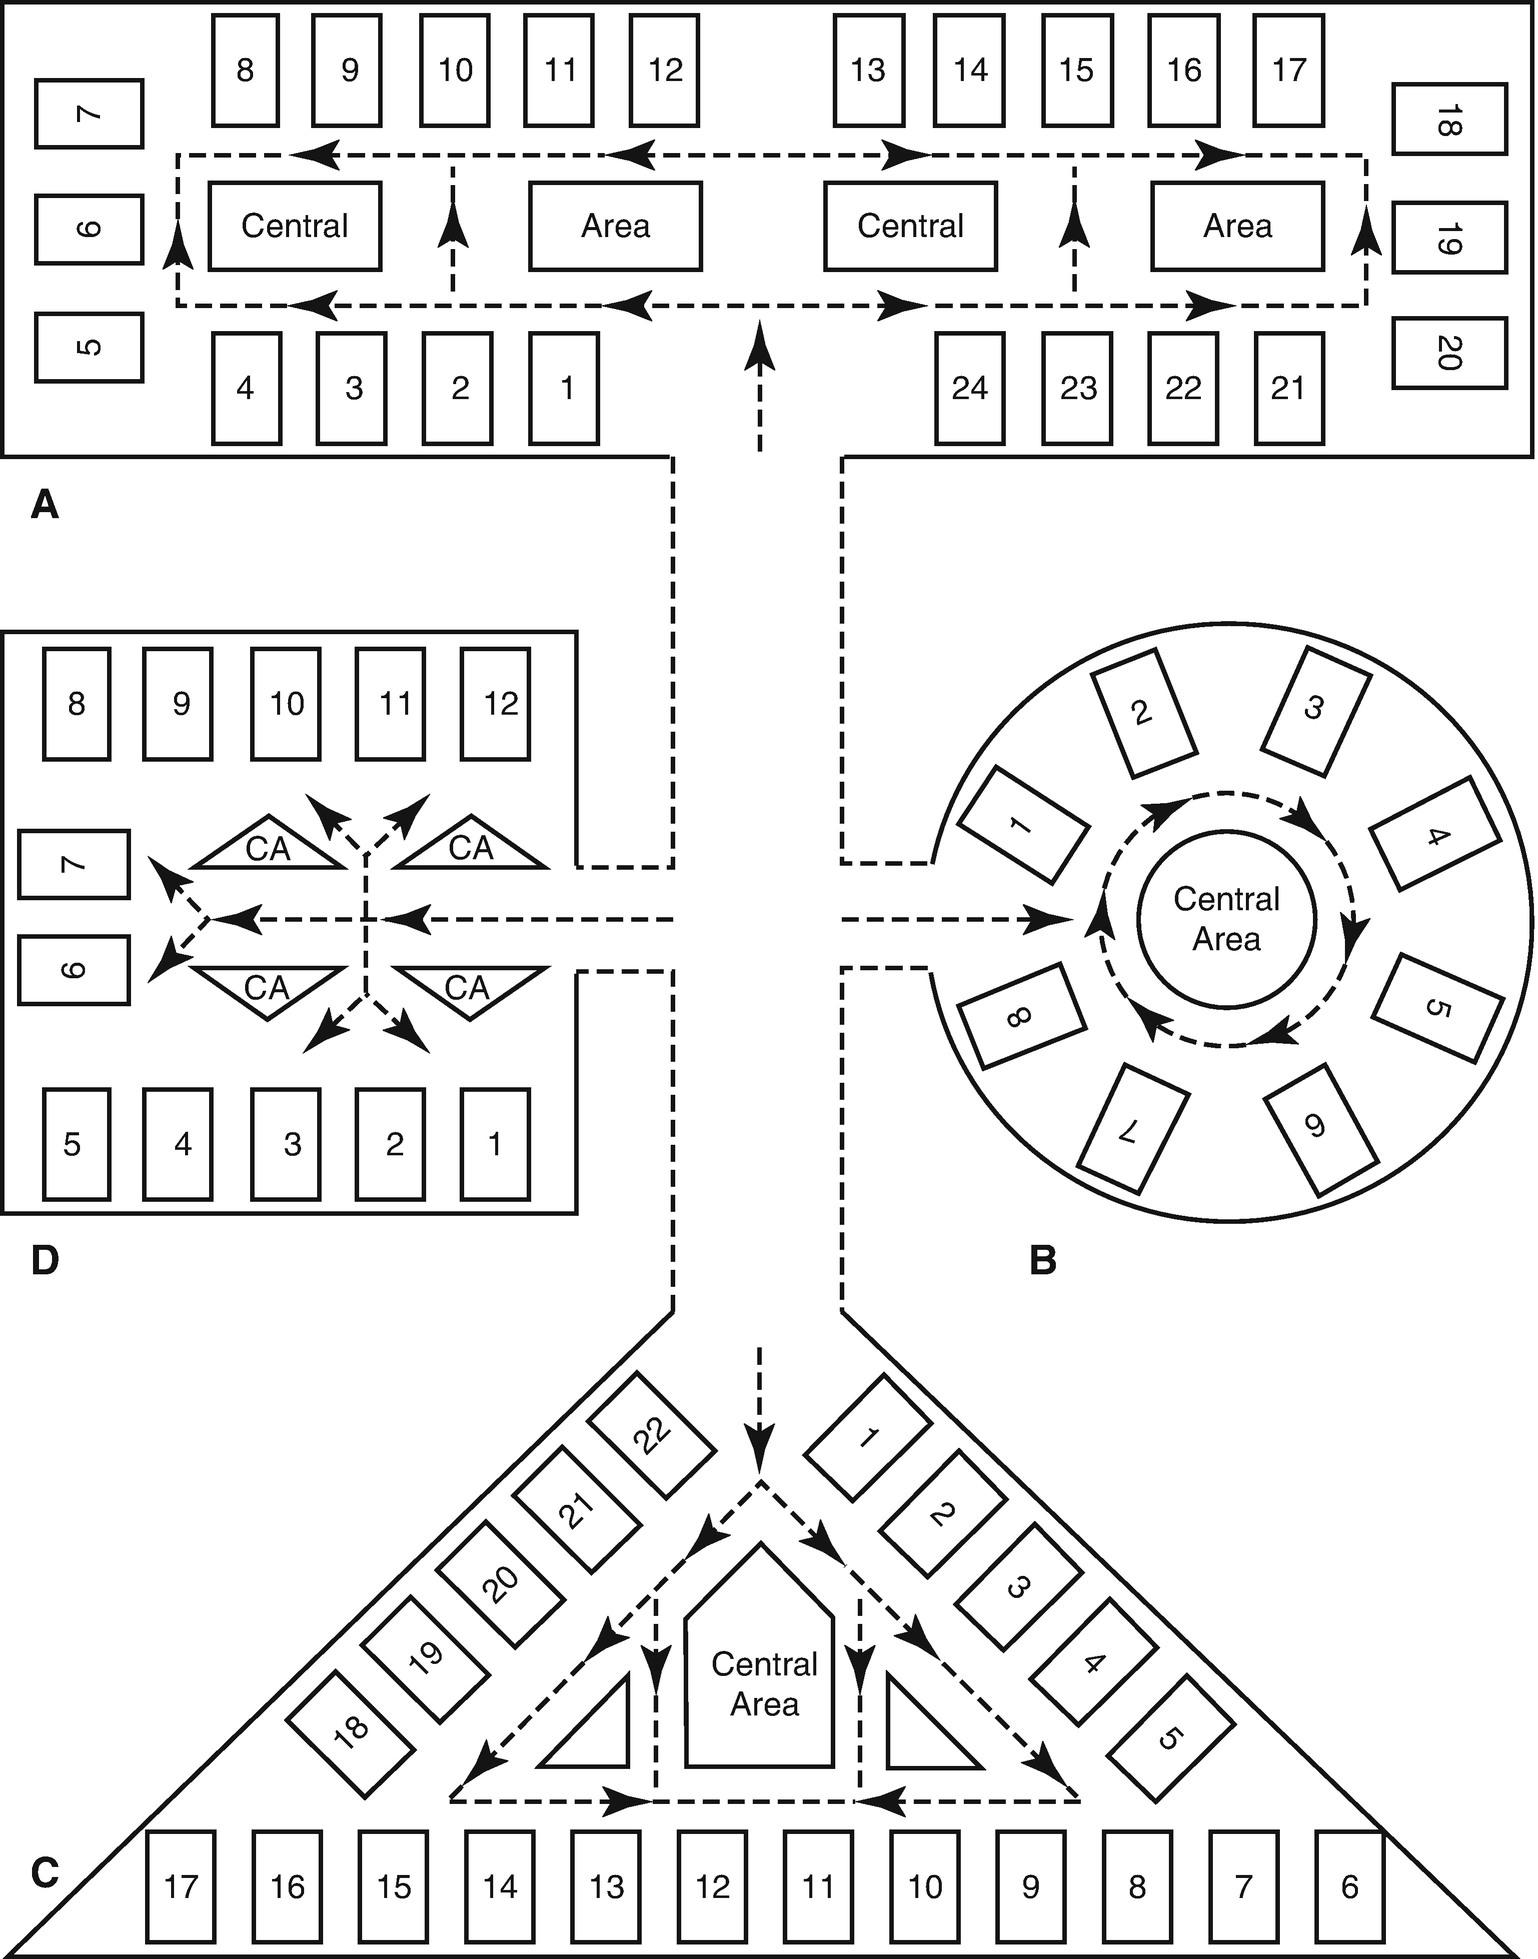 Hulumtim shkencor ebook ebook ballew us array interior map puzzle abcya interior design living room interior rh 4kpics rocks fandeluxe Images